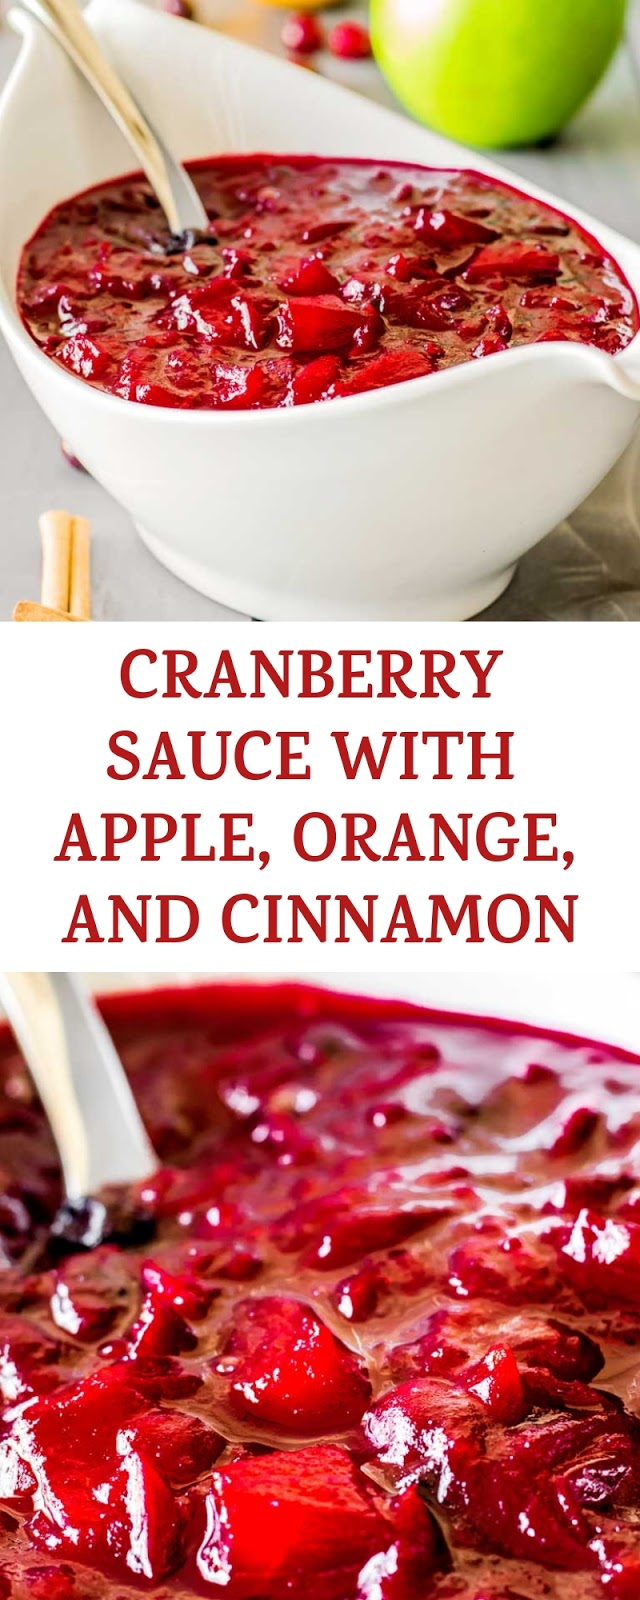 CRANBERRY SAUCE WITH APPLE, ORANGE, AND CINNAMON